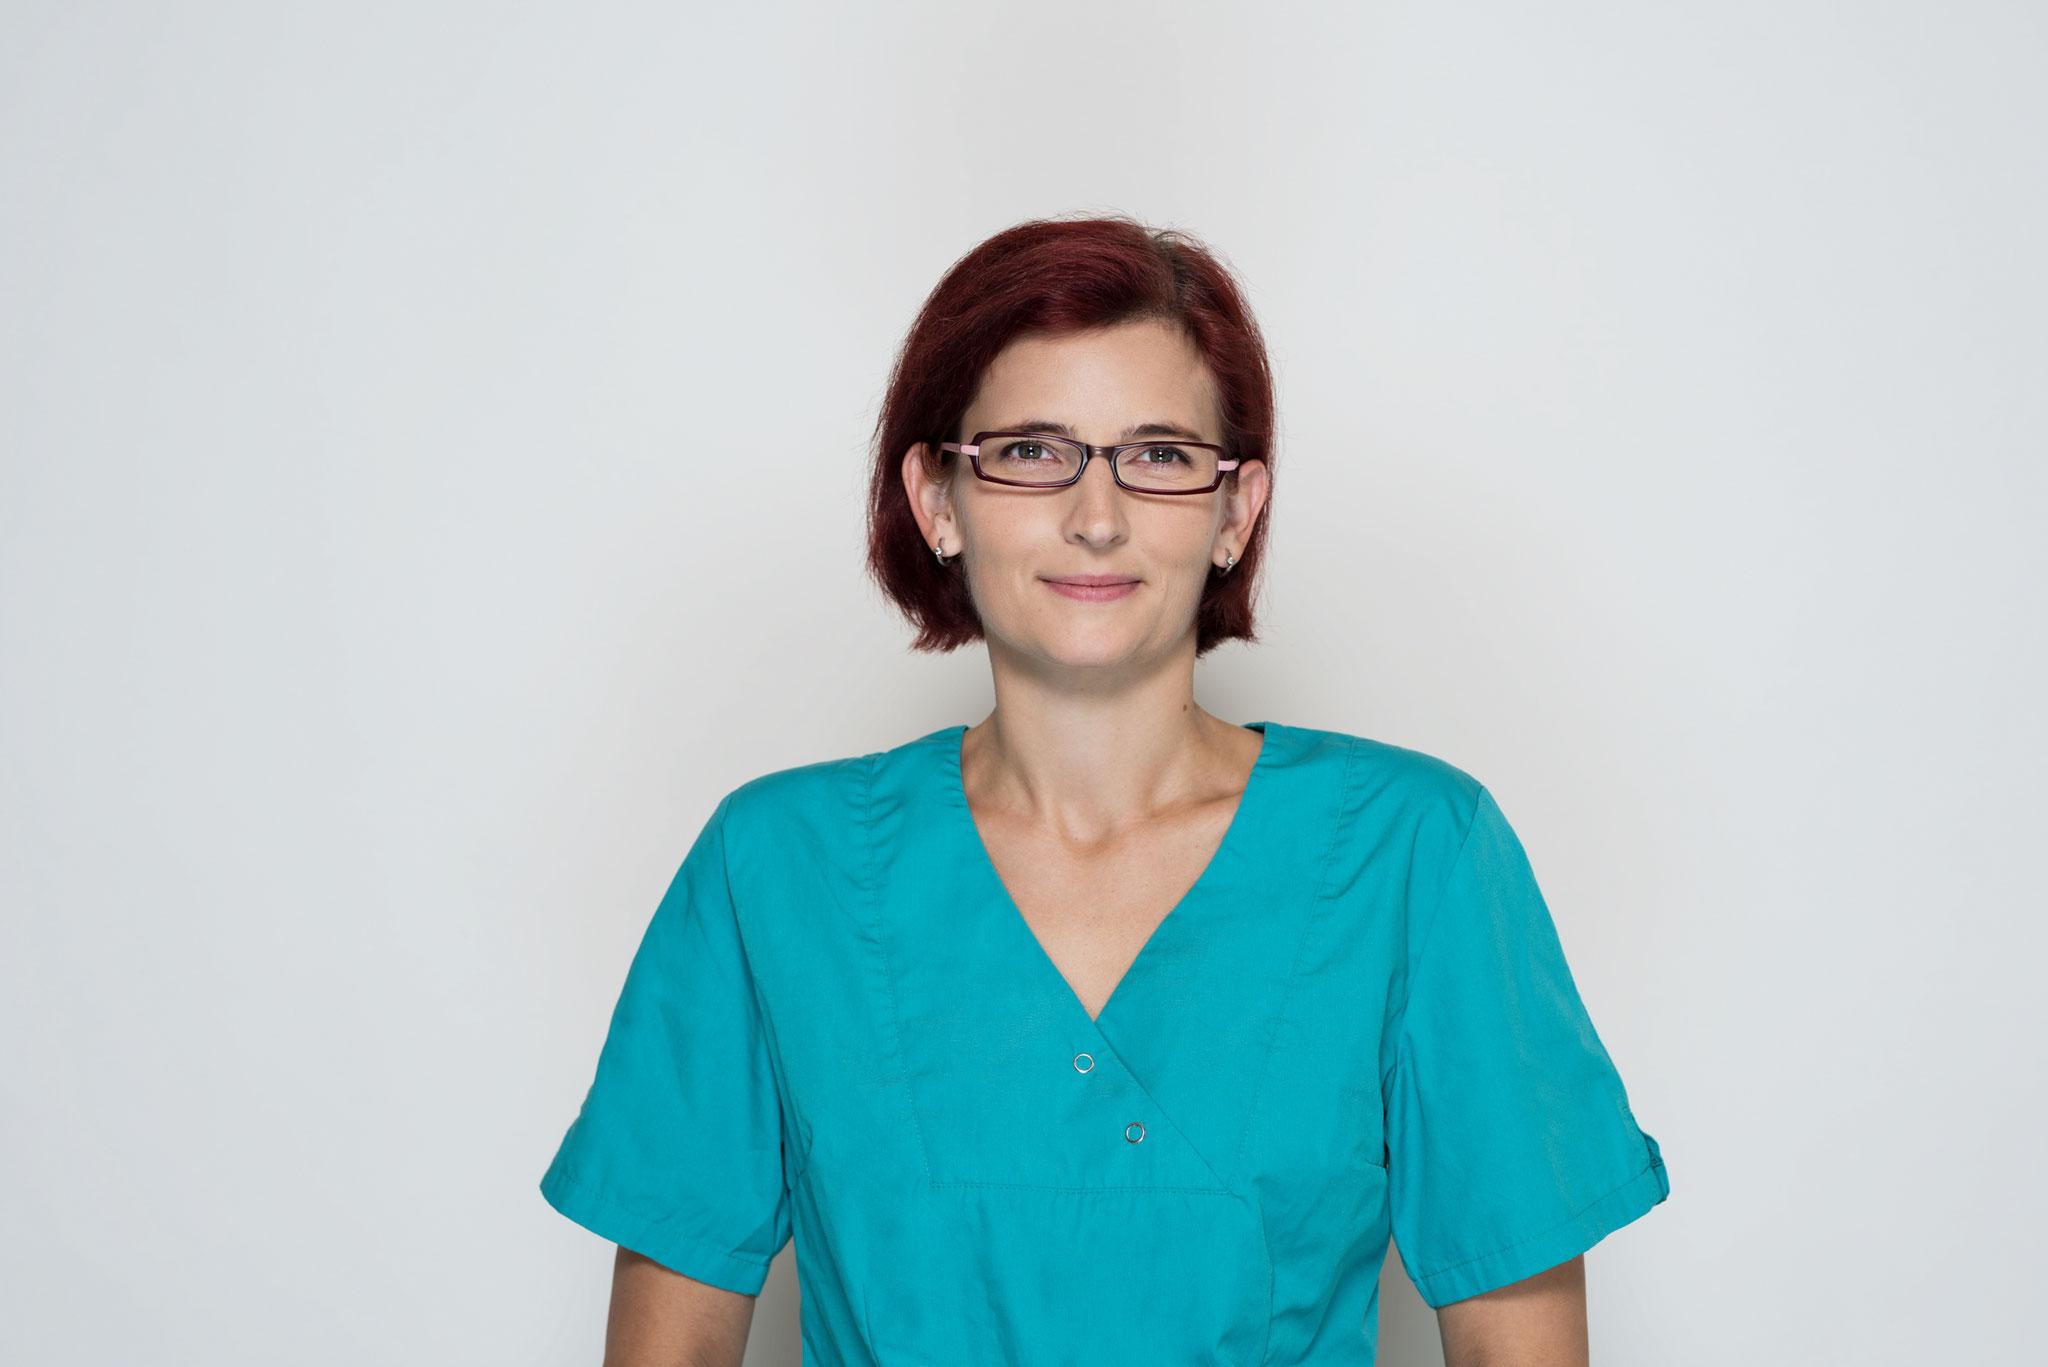 Katja Glugla, Praxisassistentin